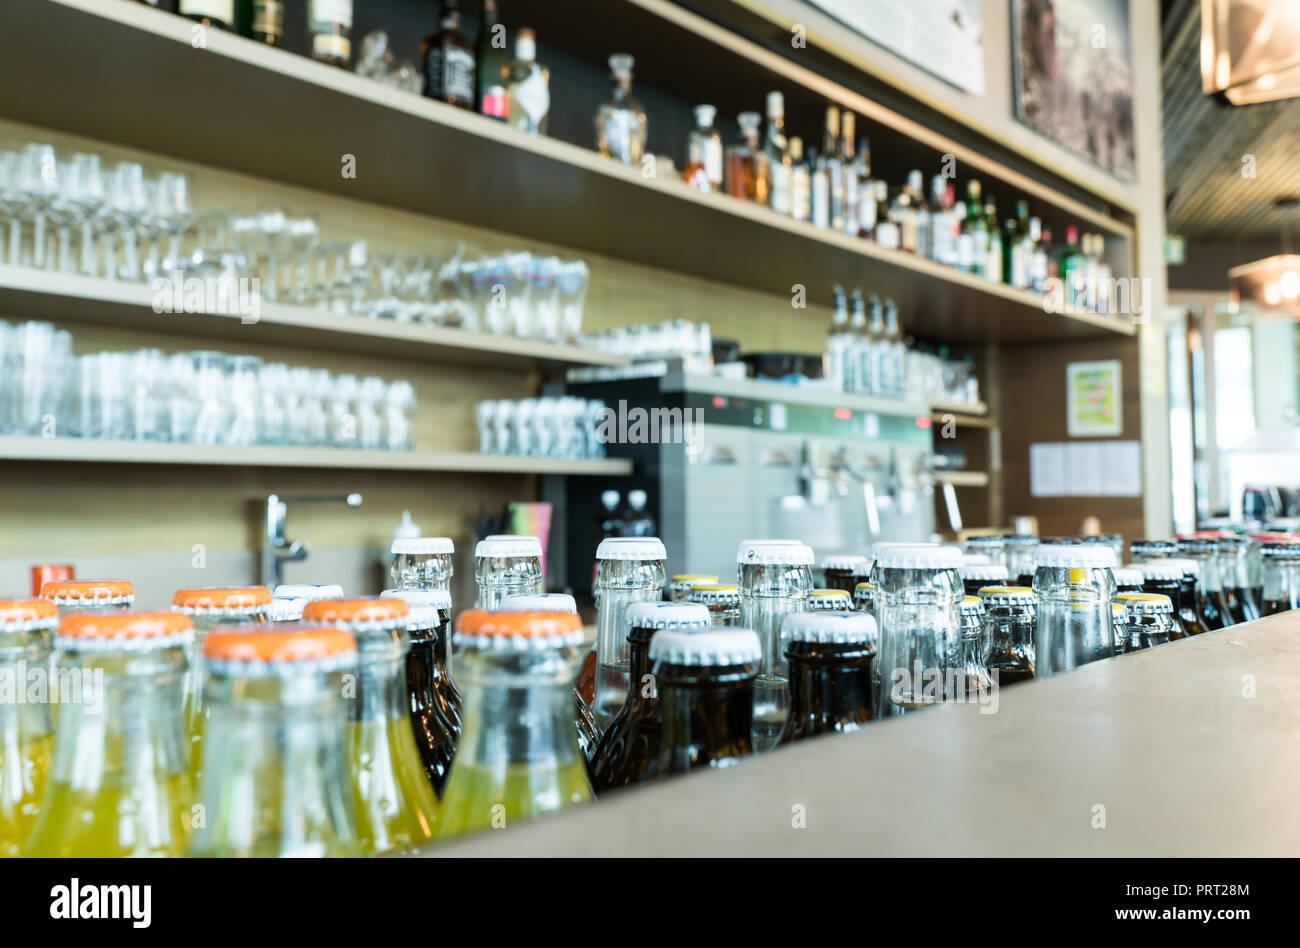 Bottles Behind A Bar Stock Photos & Bottles Behind A Bar Stock ...